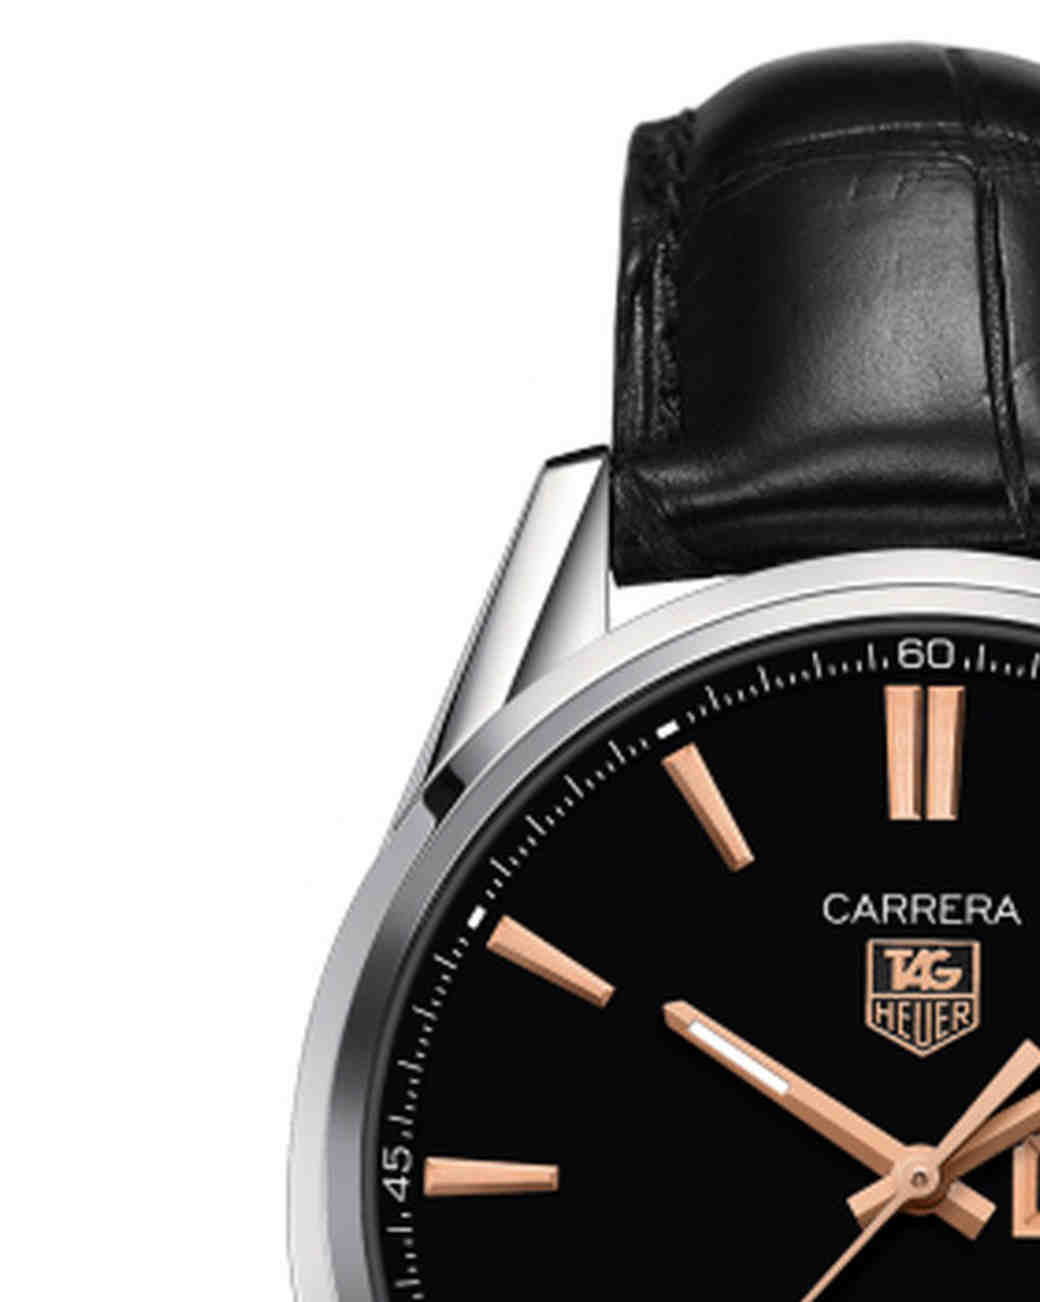 TAG Heuer Carrera Calibre 5 Watch